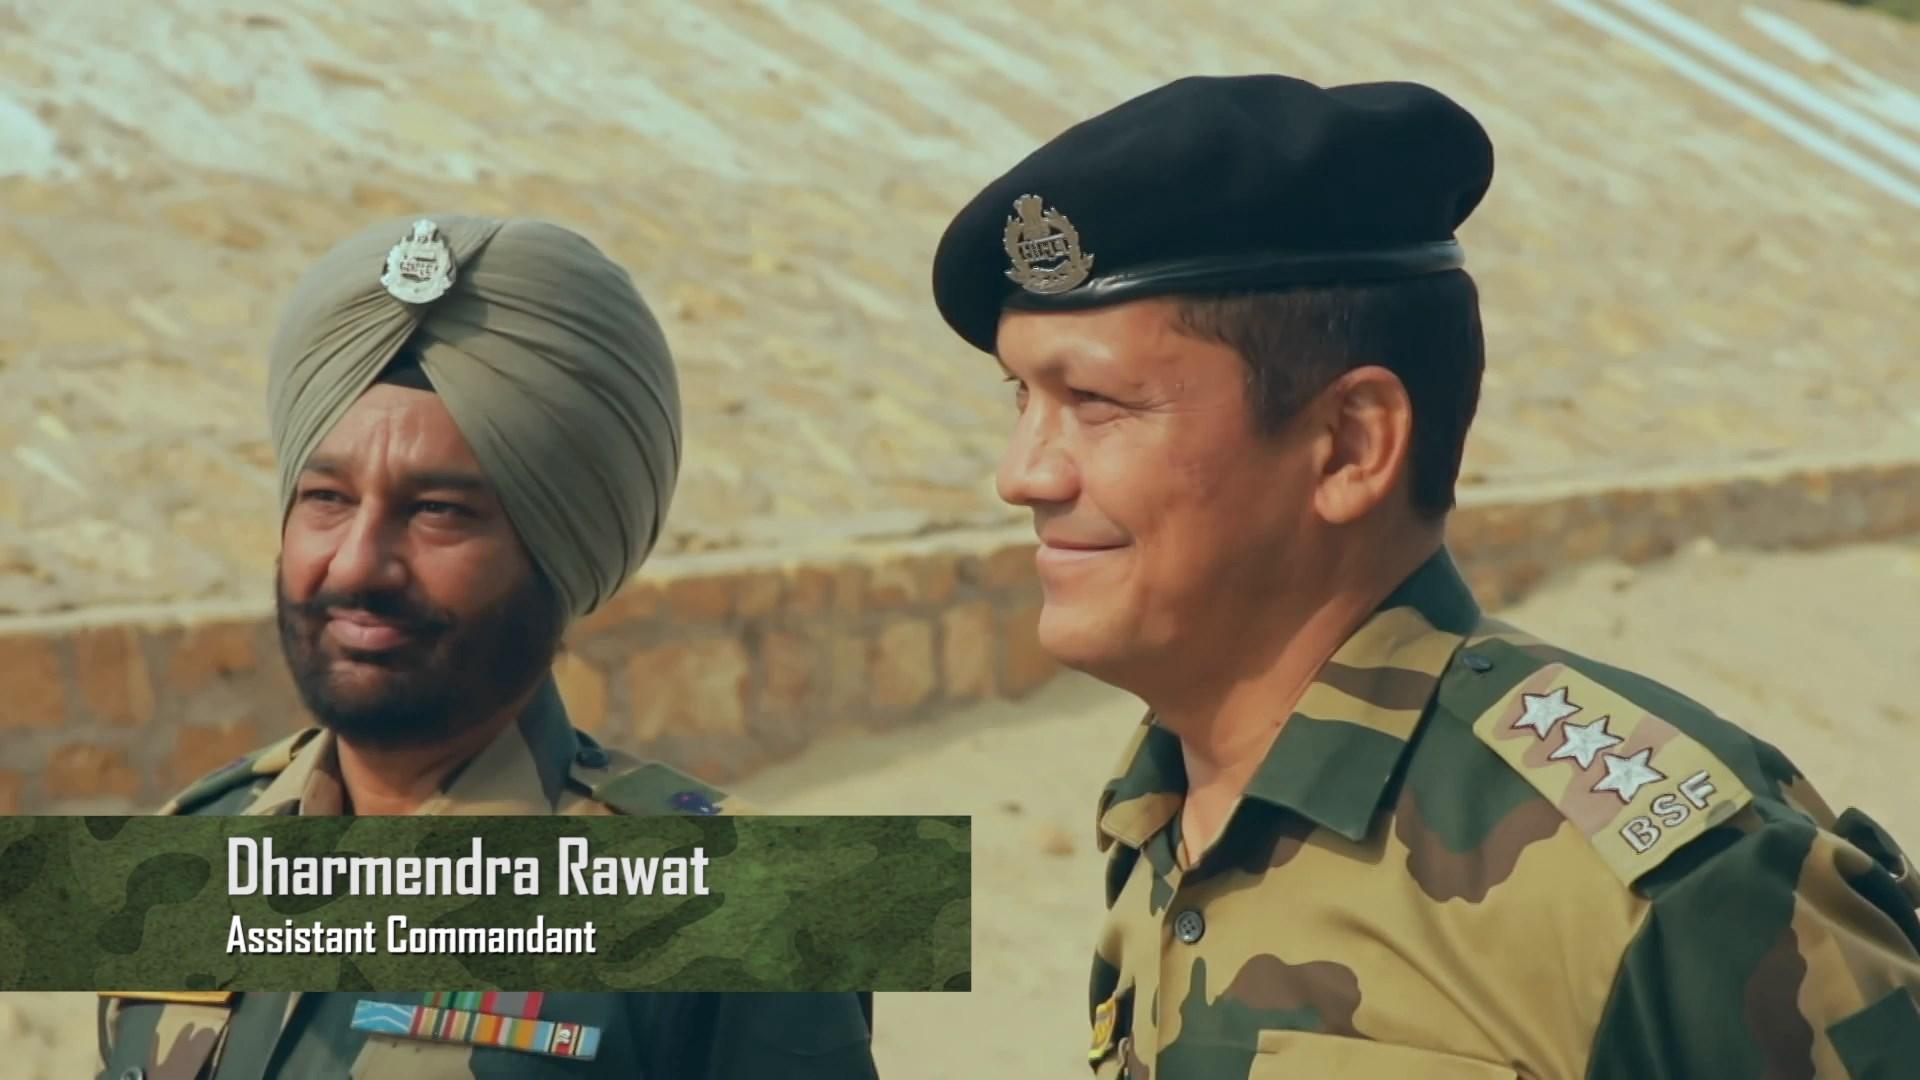 Download Mission Frontline with Rana Daggubati 2021 (Season 1) Hindi {Discovery+ Series} WeB-DL